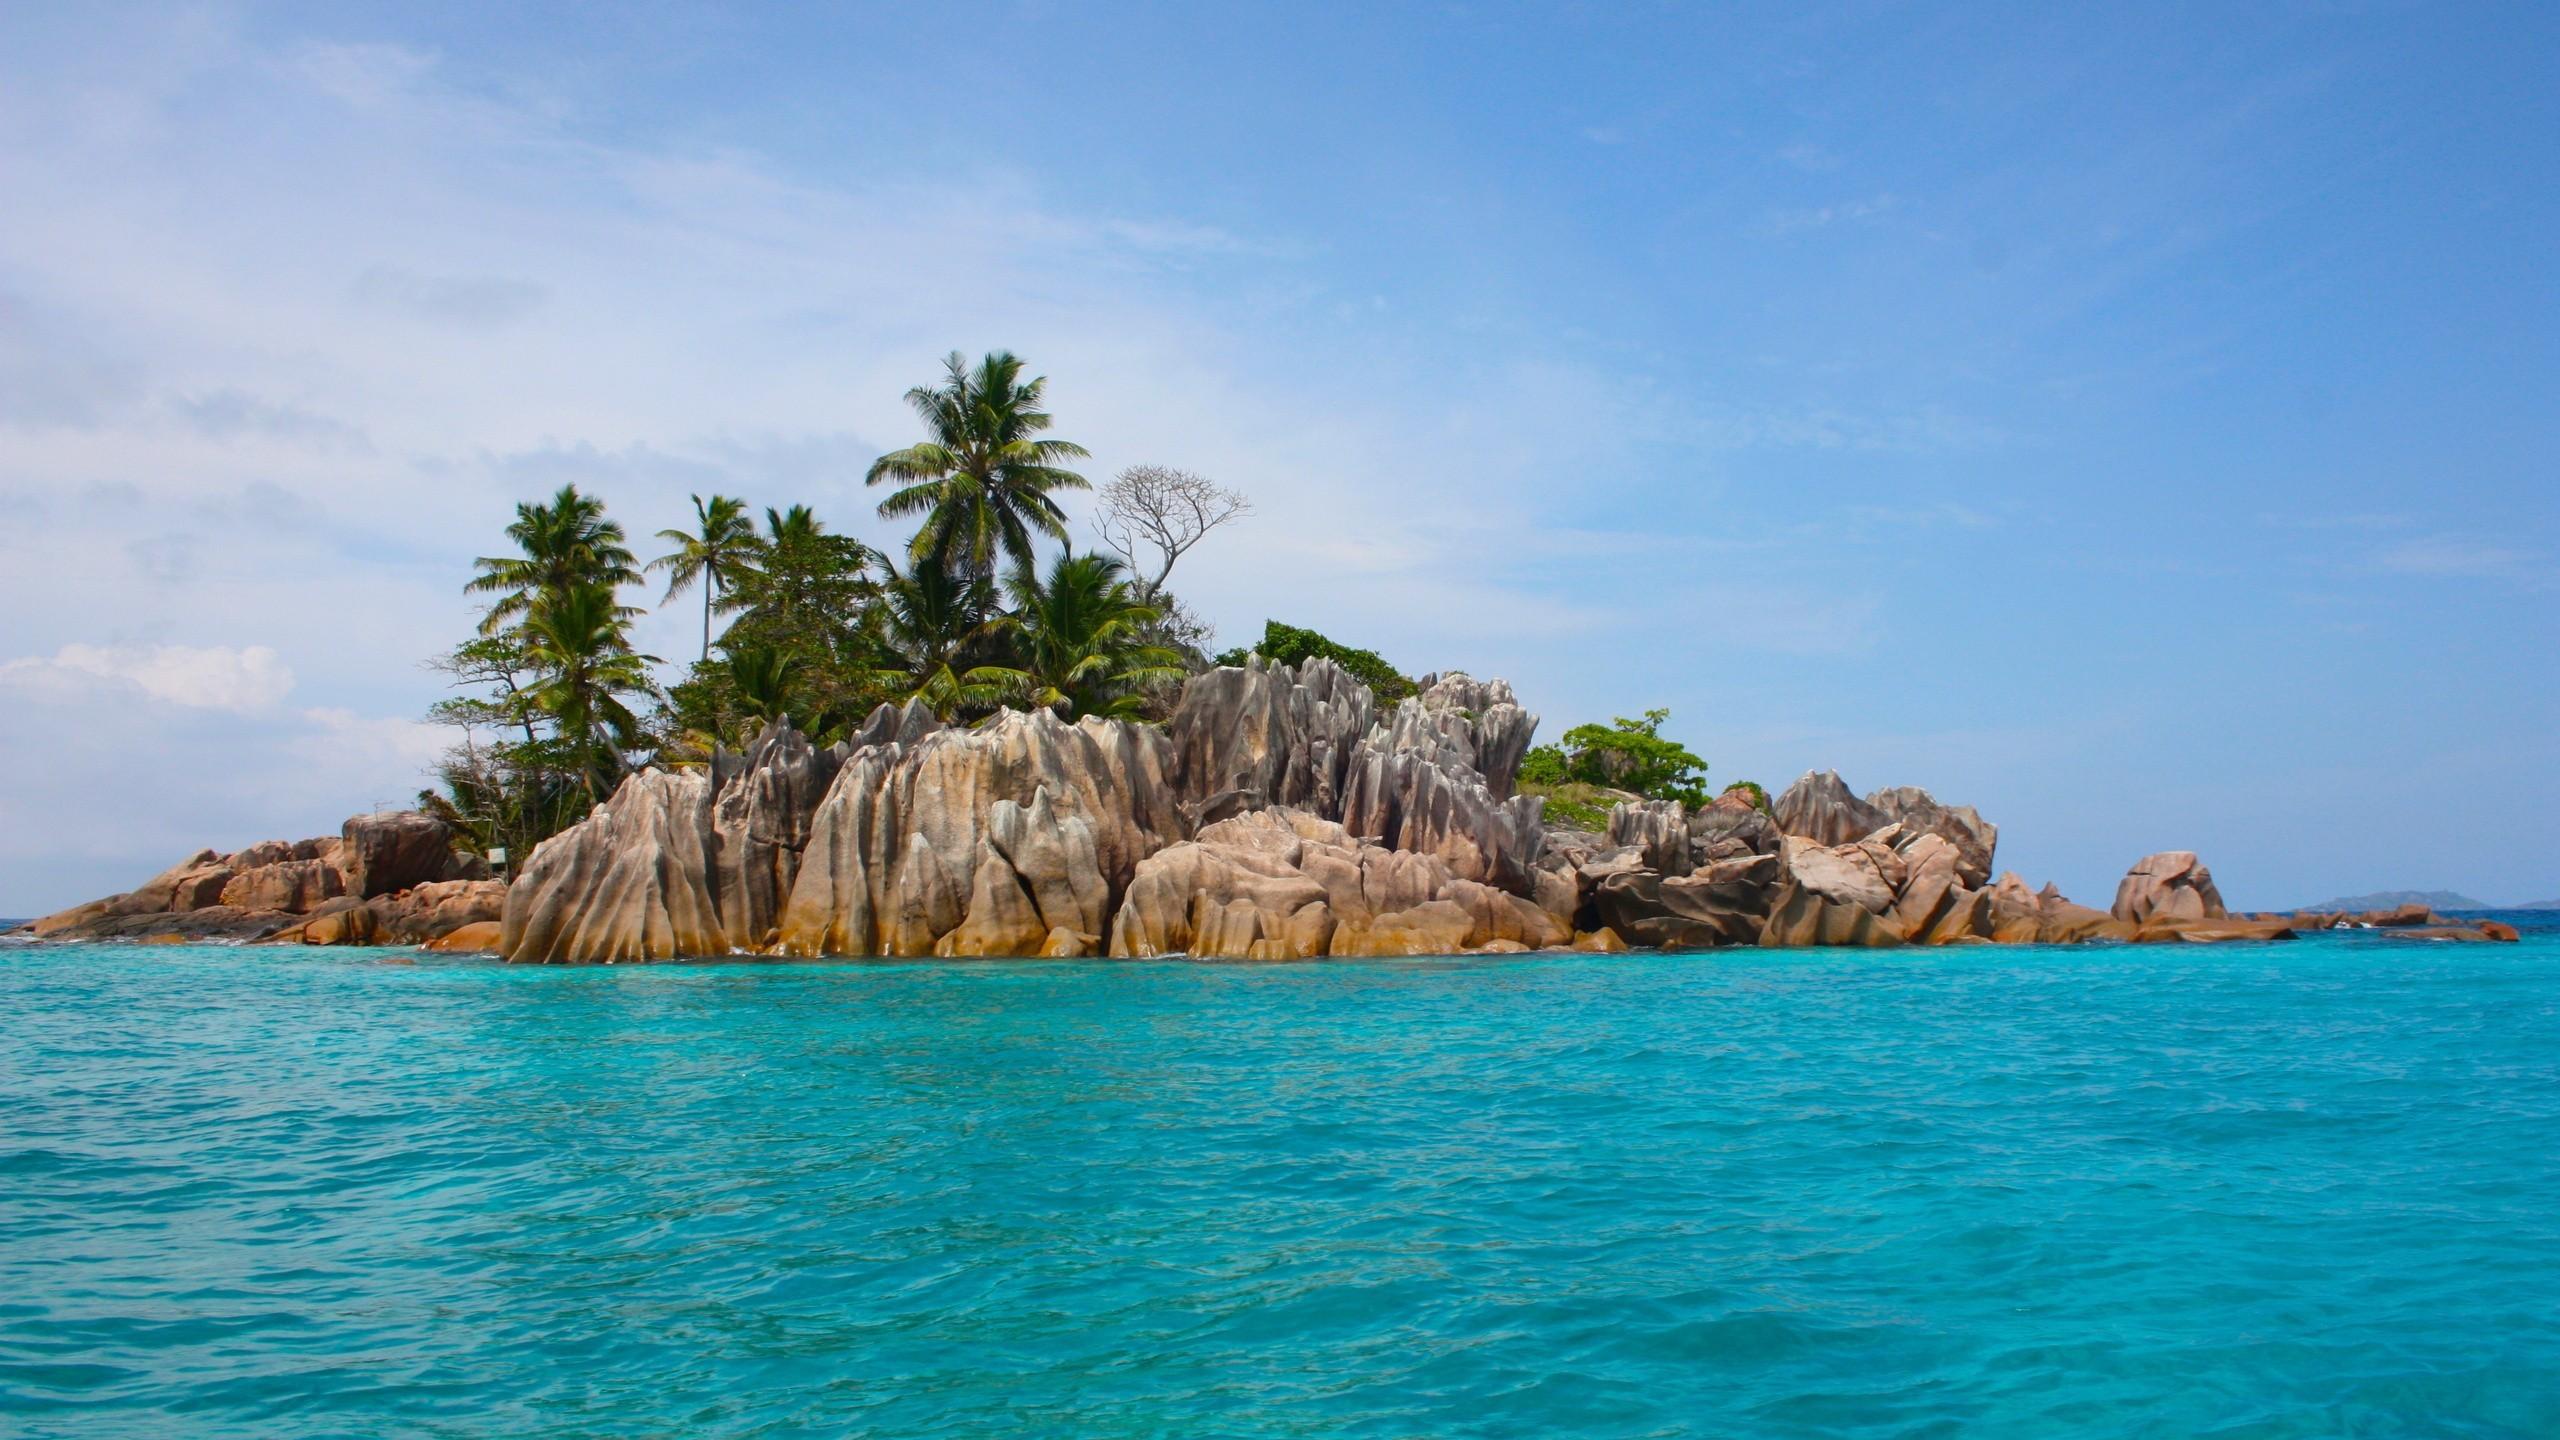 Island Paradise Getaway Remote Blue Ocean Tranquil Tropical Beach Wallpaper  Galaxy S3